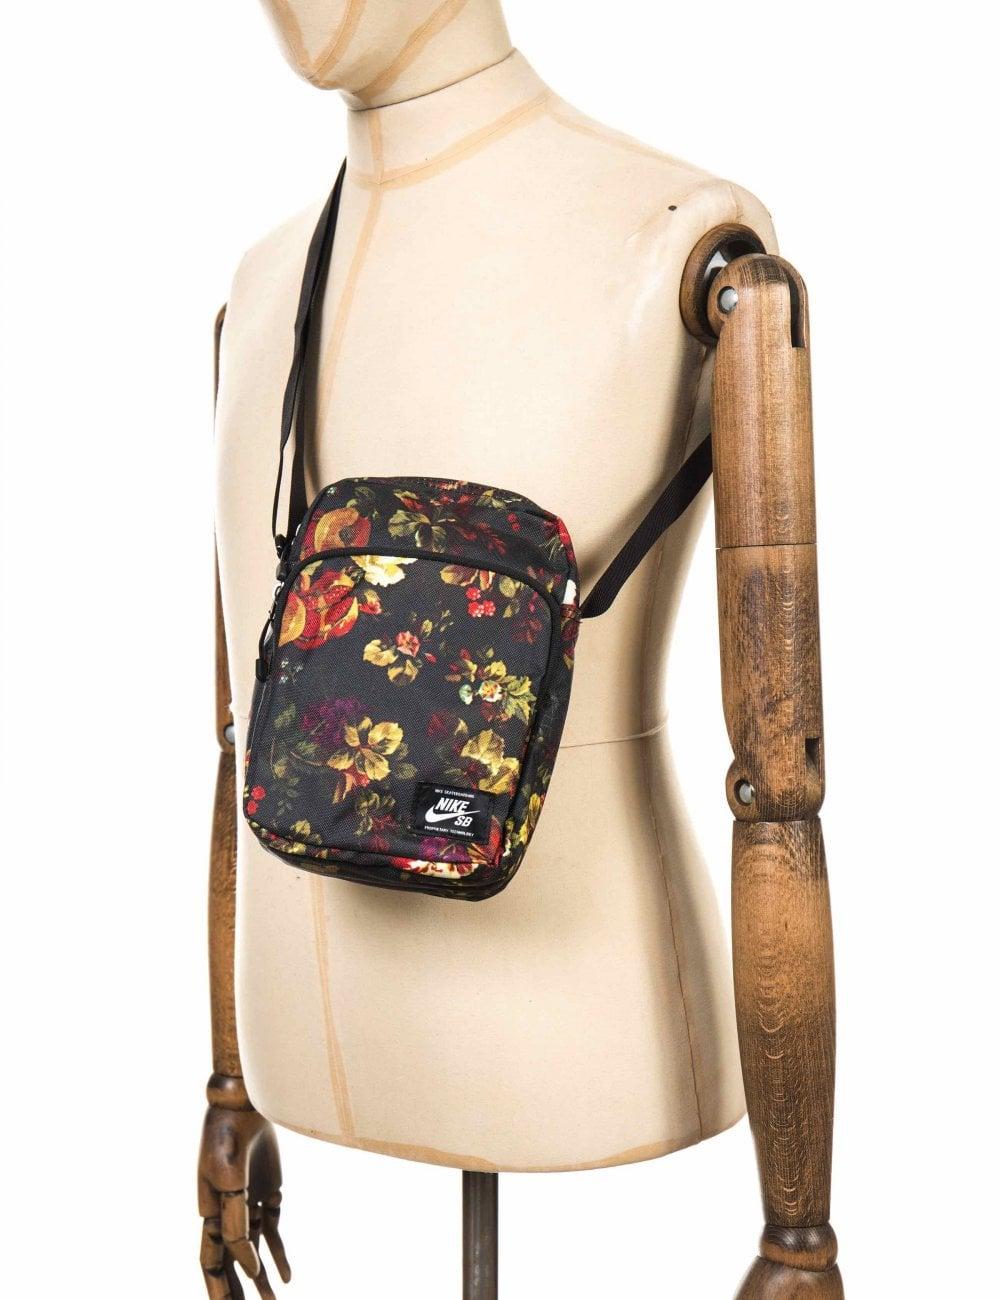 4014933df10a Nike SB Small Item Bag - Black AOP - Accessories from Fat Buddha ...